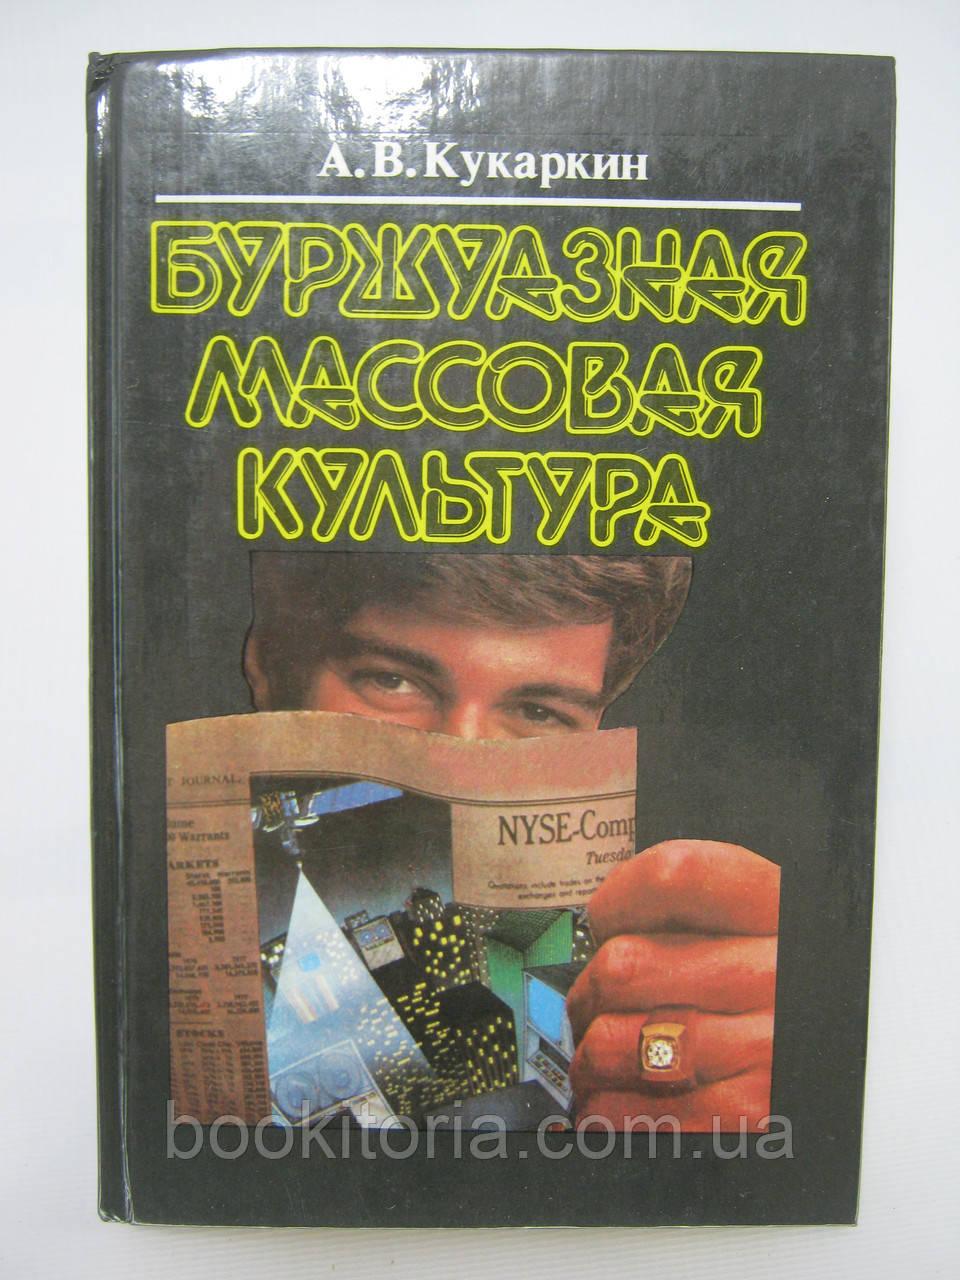 Кукаркин А.В. Буржуазная массовая культура (б/у).